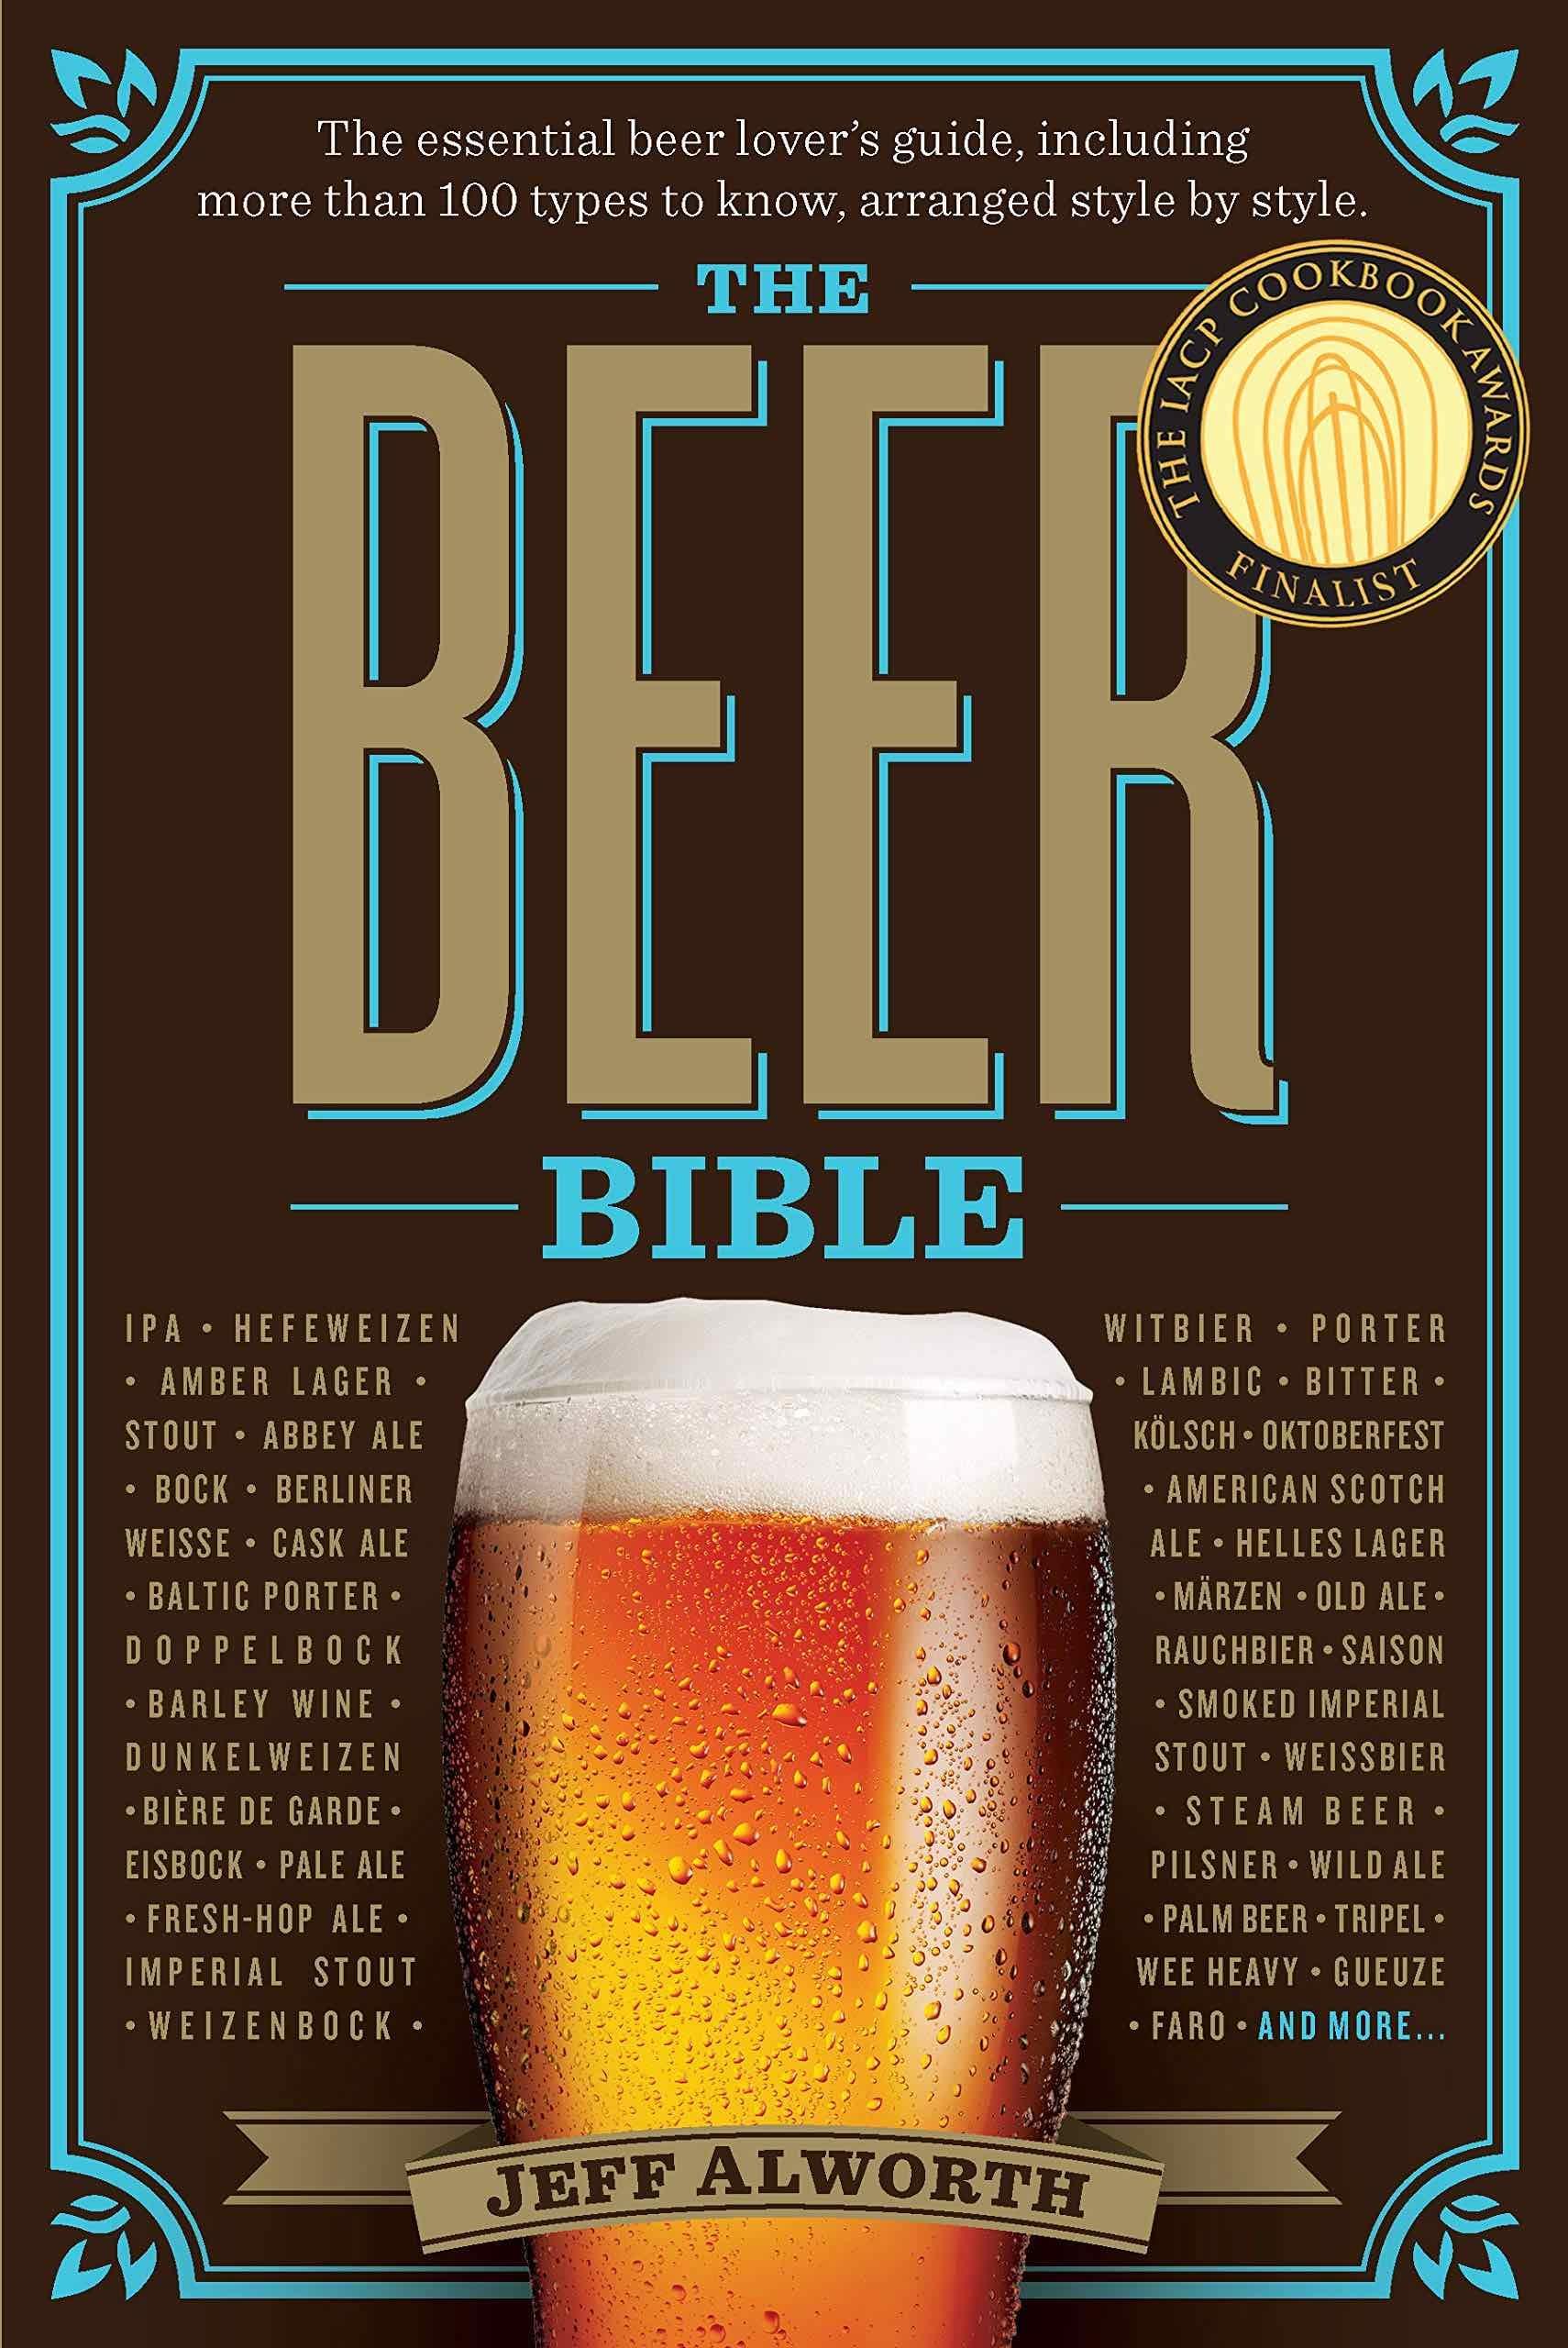 Jeff Alworth Author of The Beer Bible – Craft Beer Podcast Episode 1 ~ Portland Beer Podcast Episode 1 by Steven Shomler